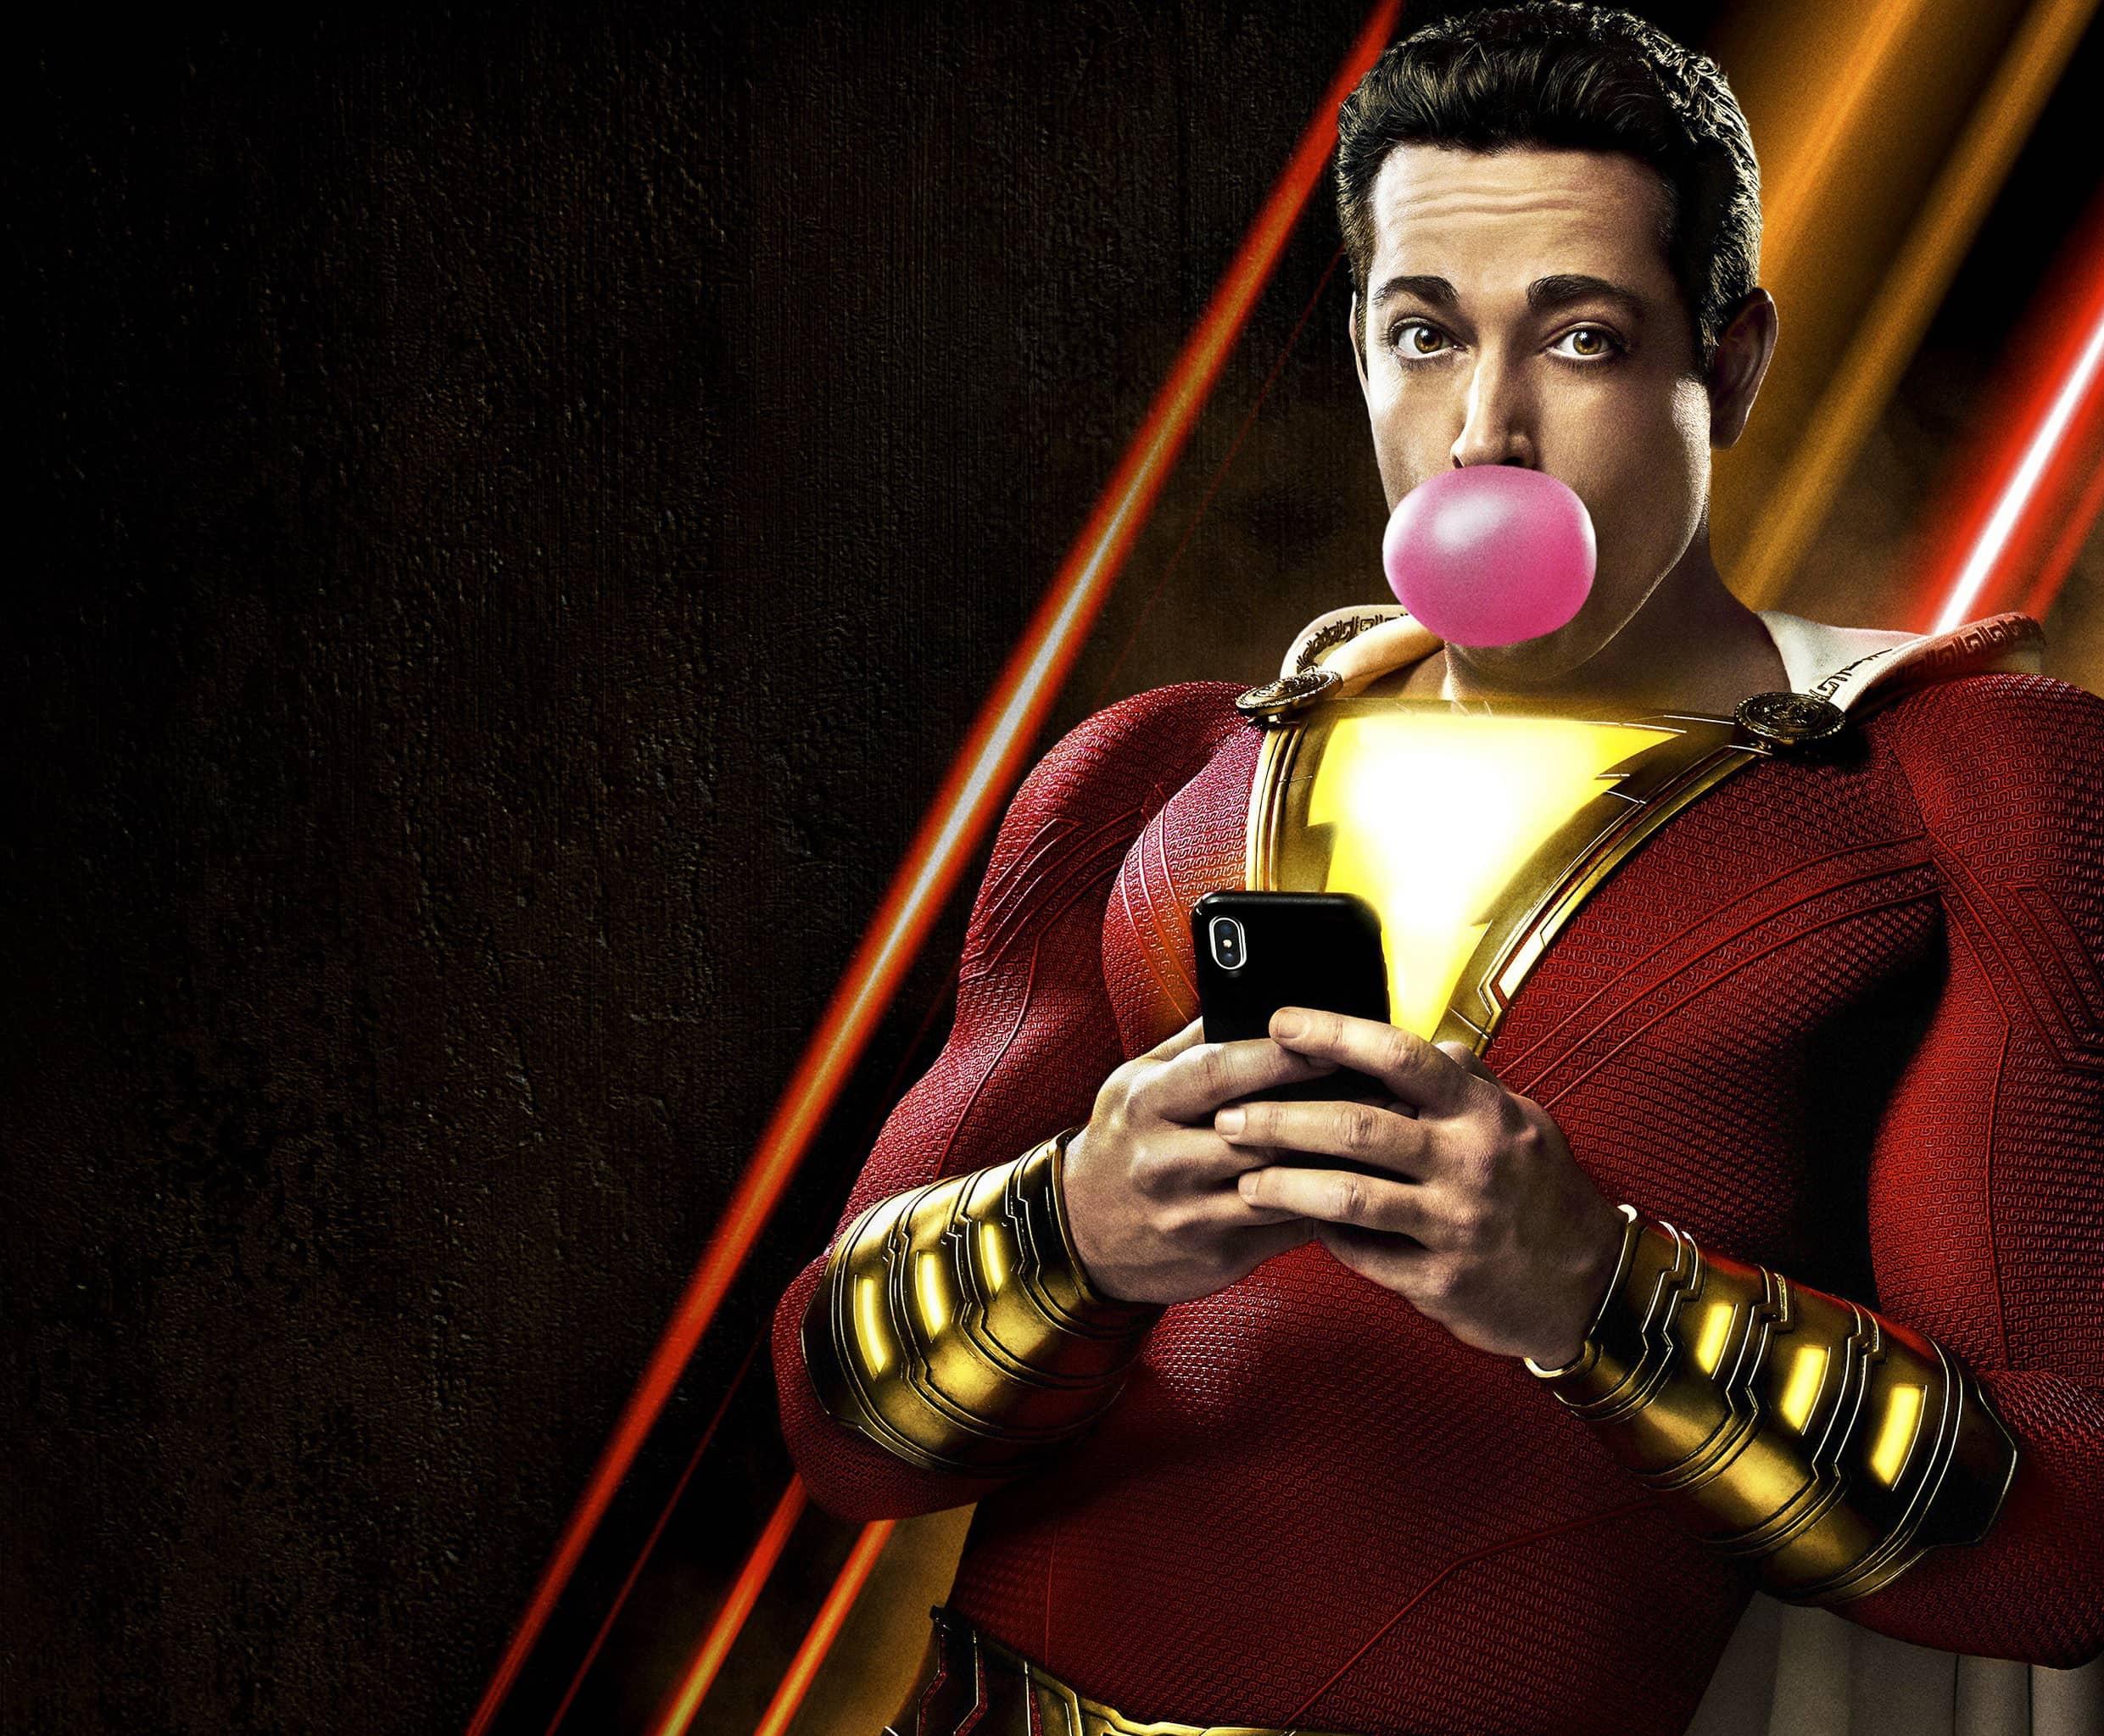 DC Superhero Pic 'Shazam!' Is A Joy... Seriously